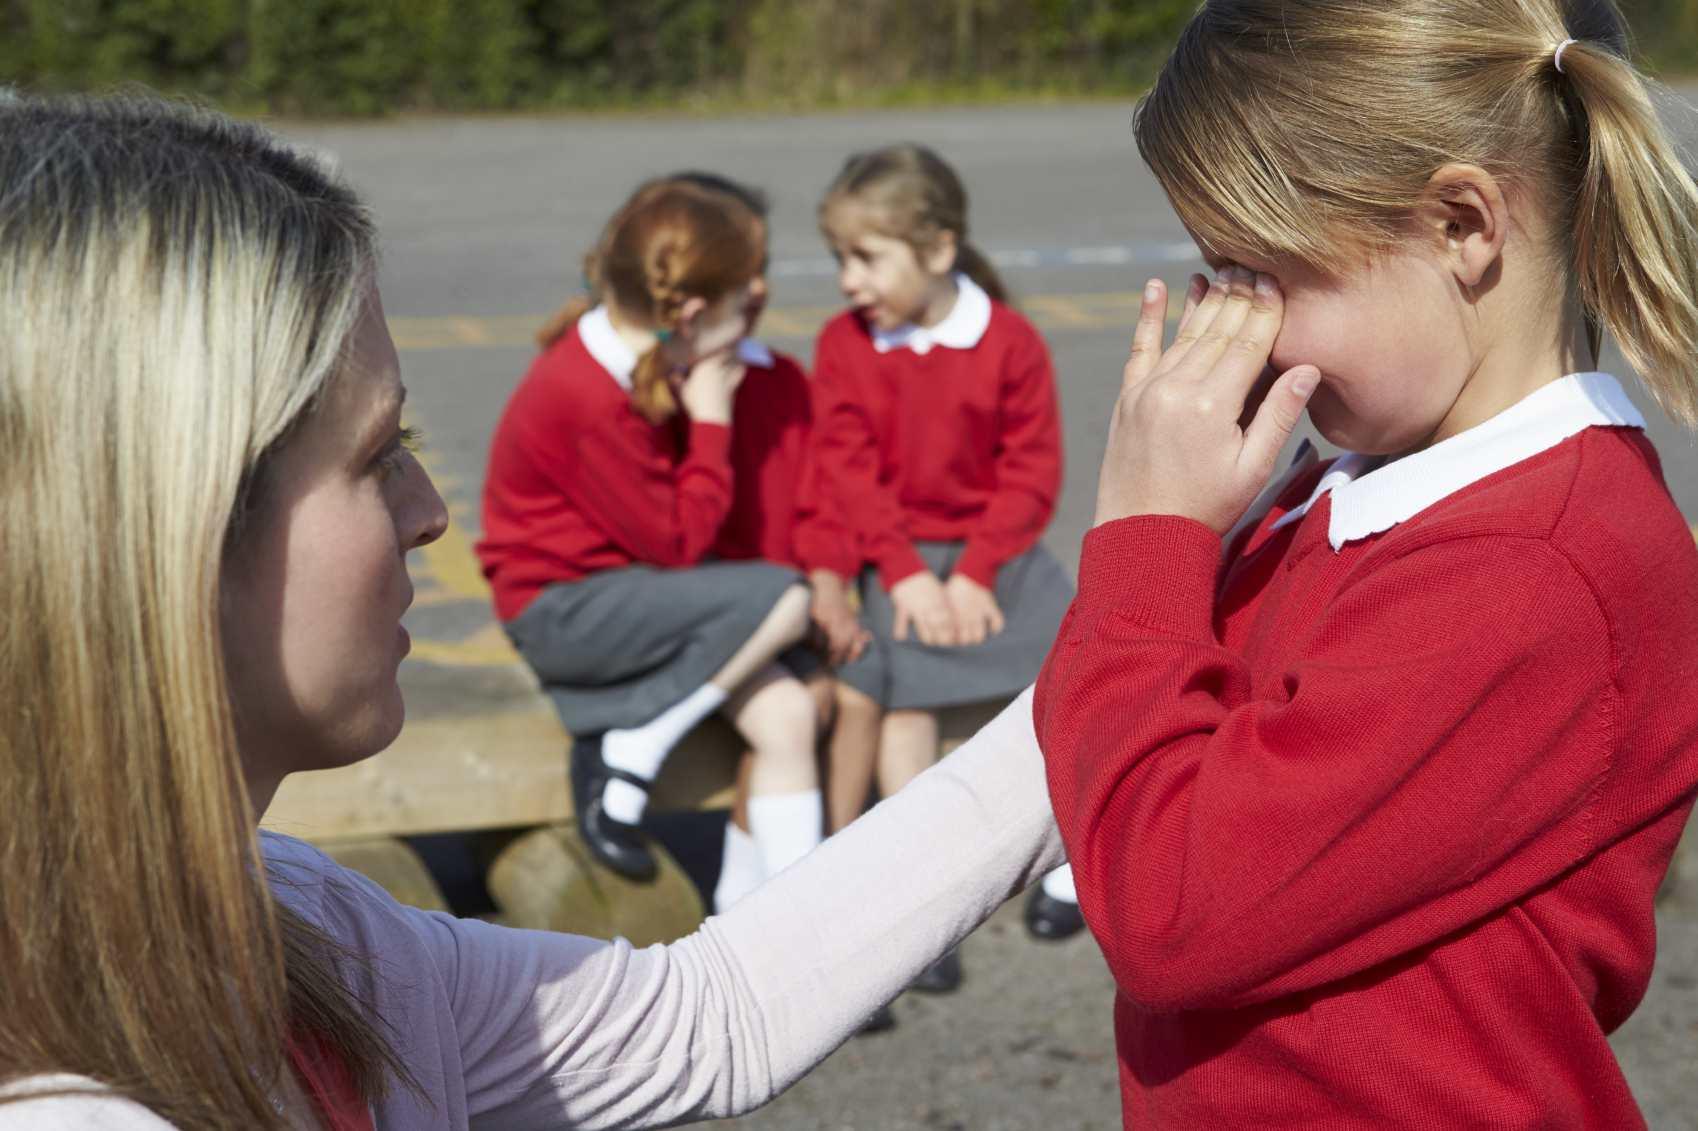 teacher comforting a student